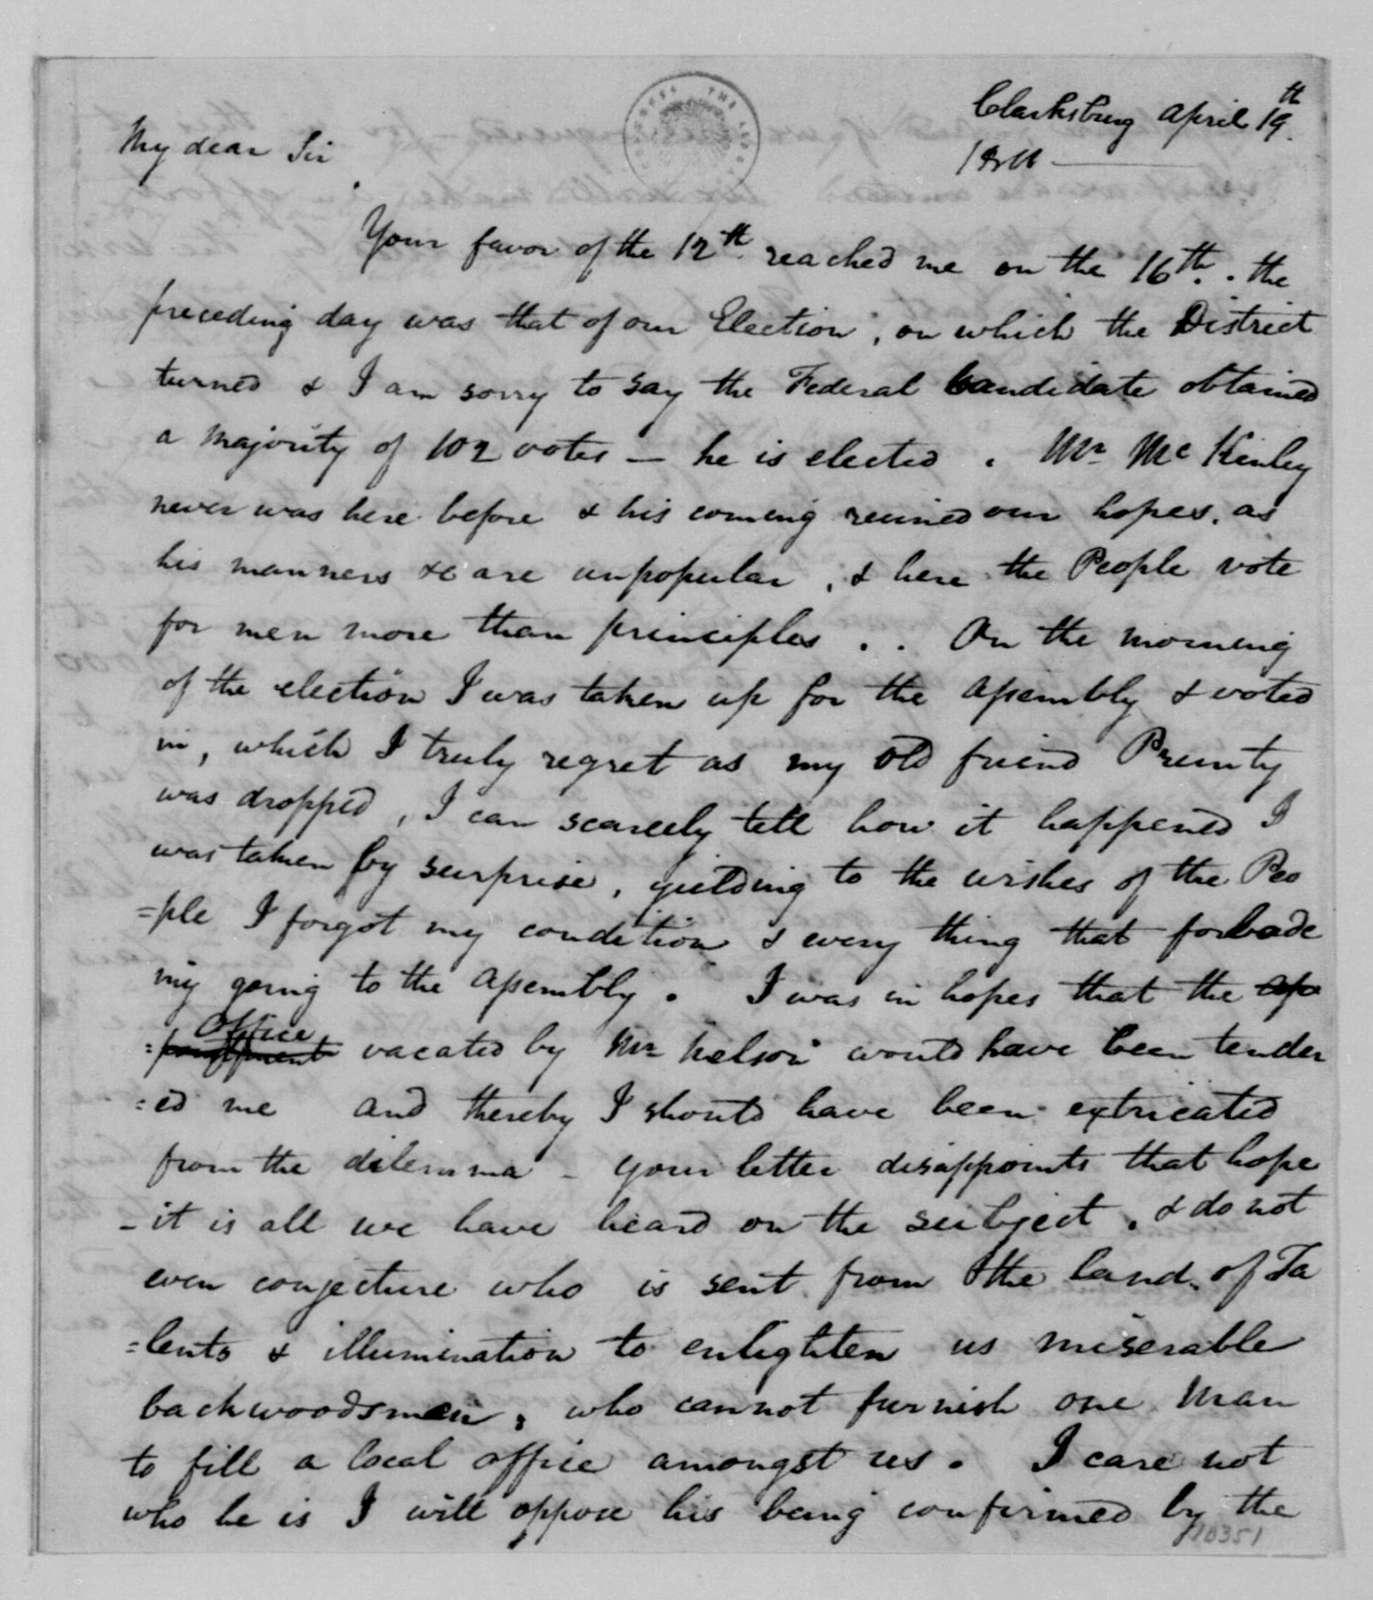 John G. Jackson to James Madison, April 19, 1811.